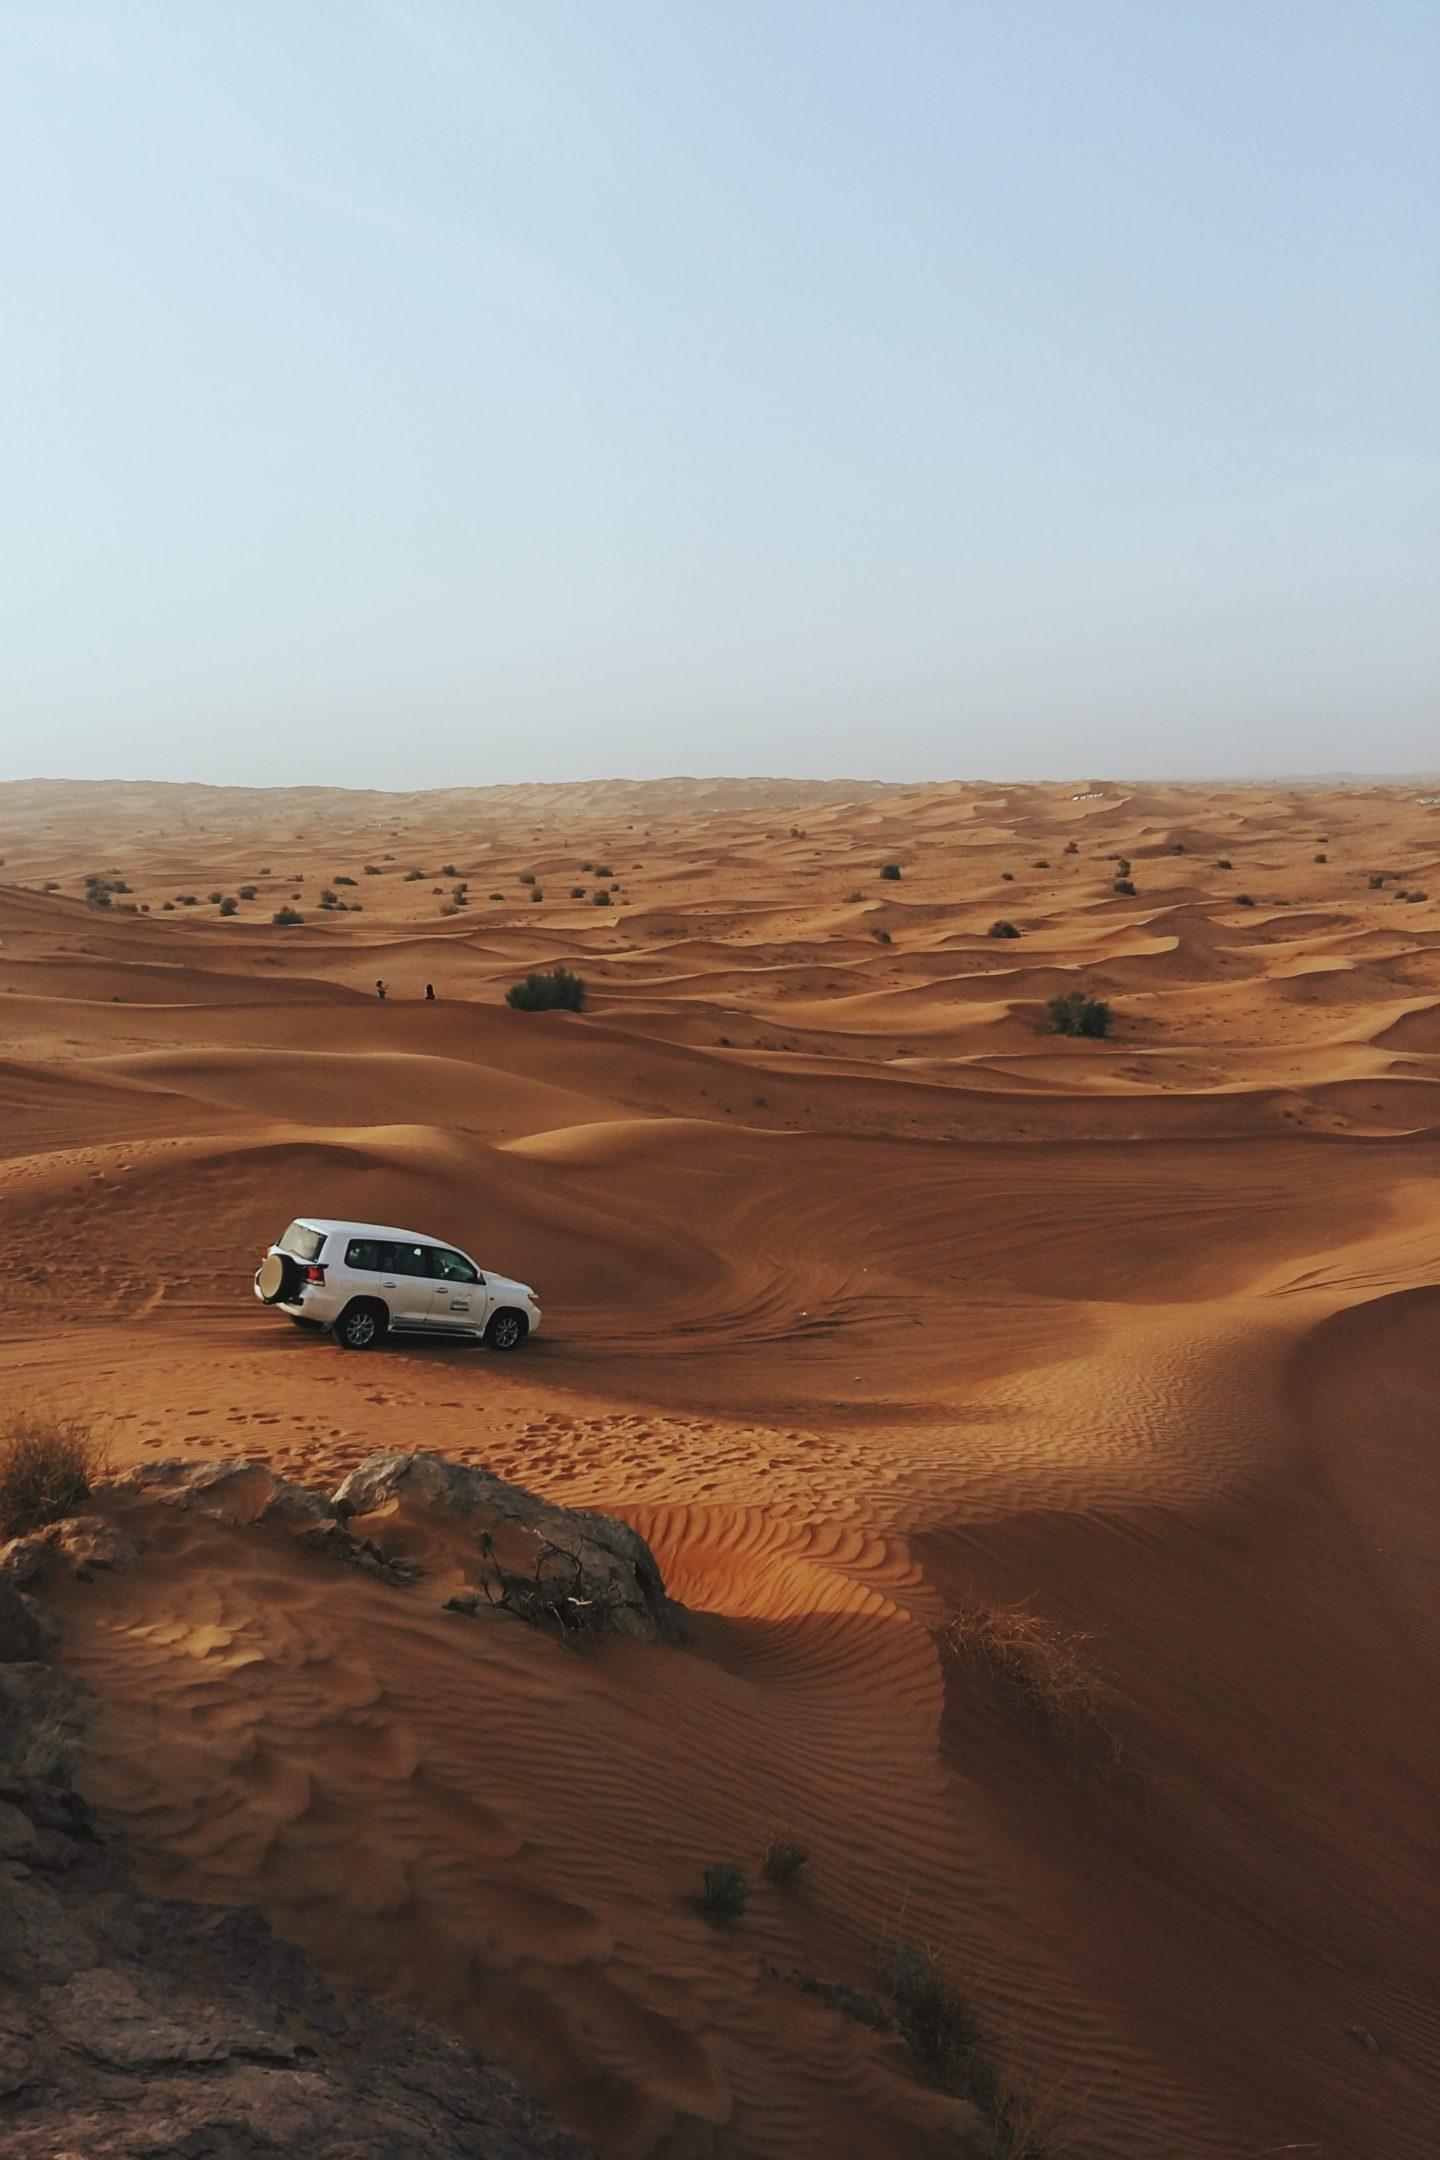 Dune bashing through the desert in Dubai